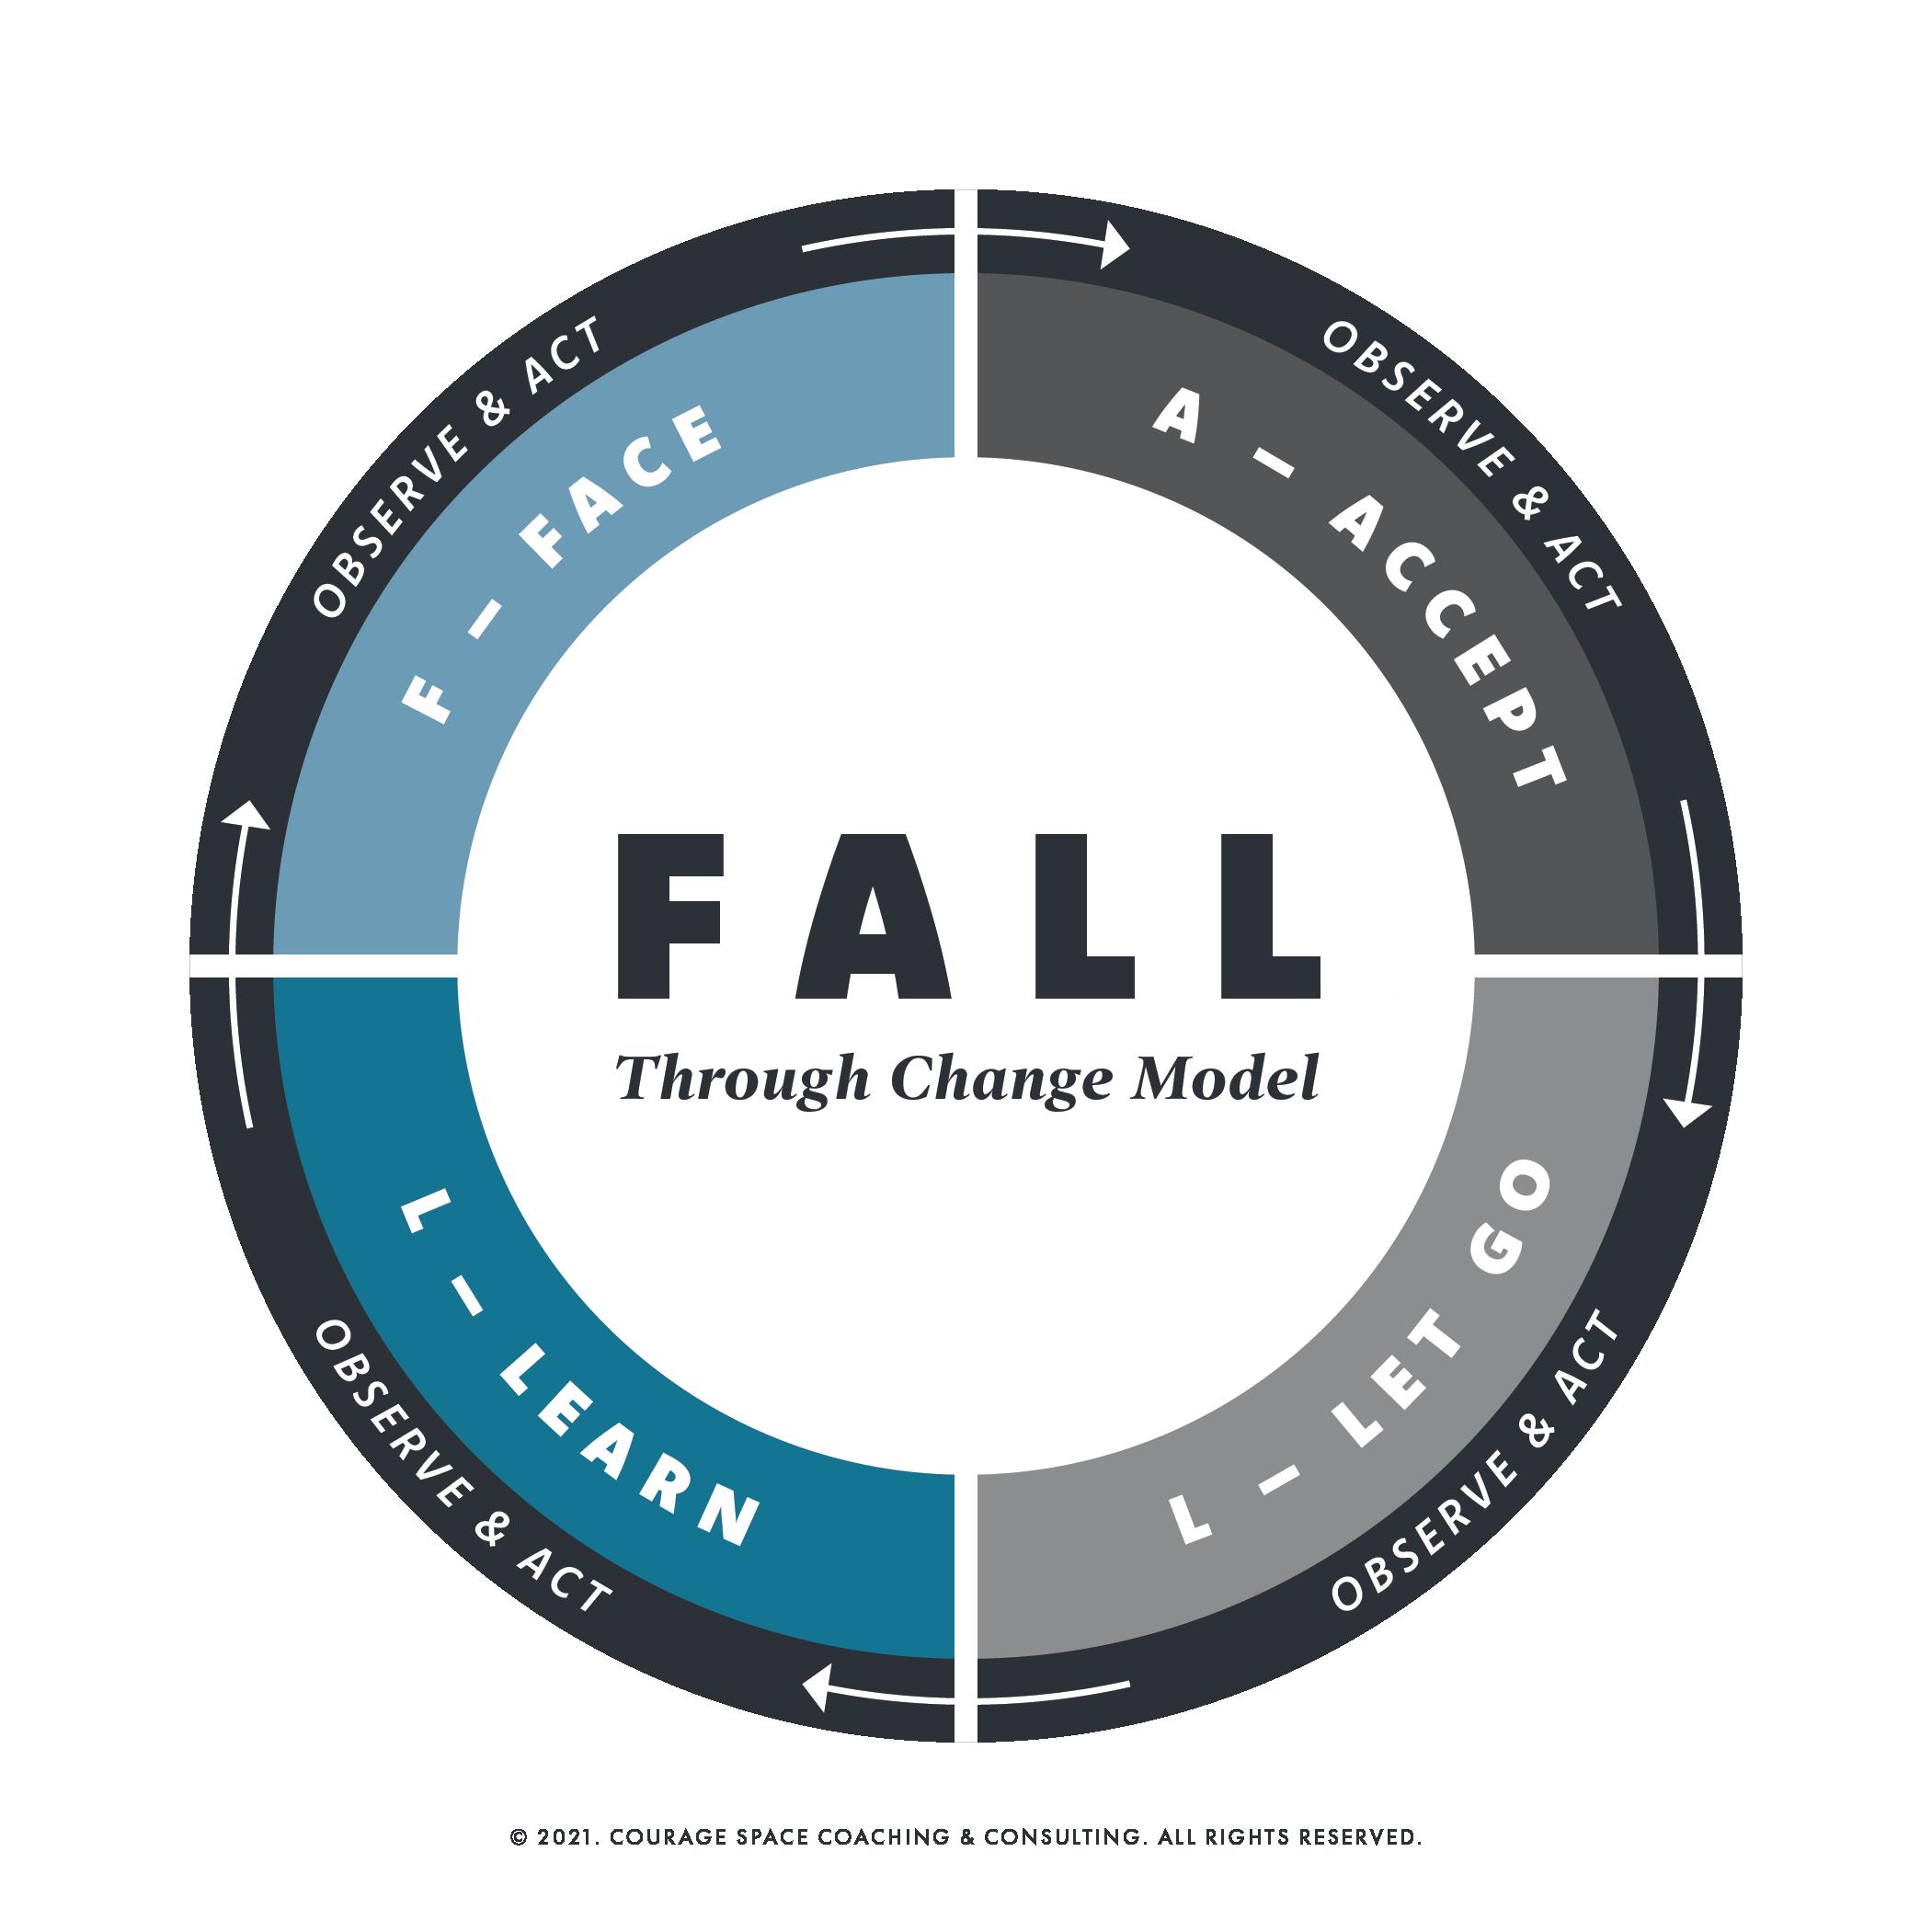 FALL Through Change Model